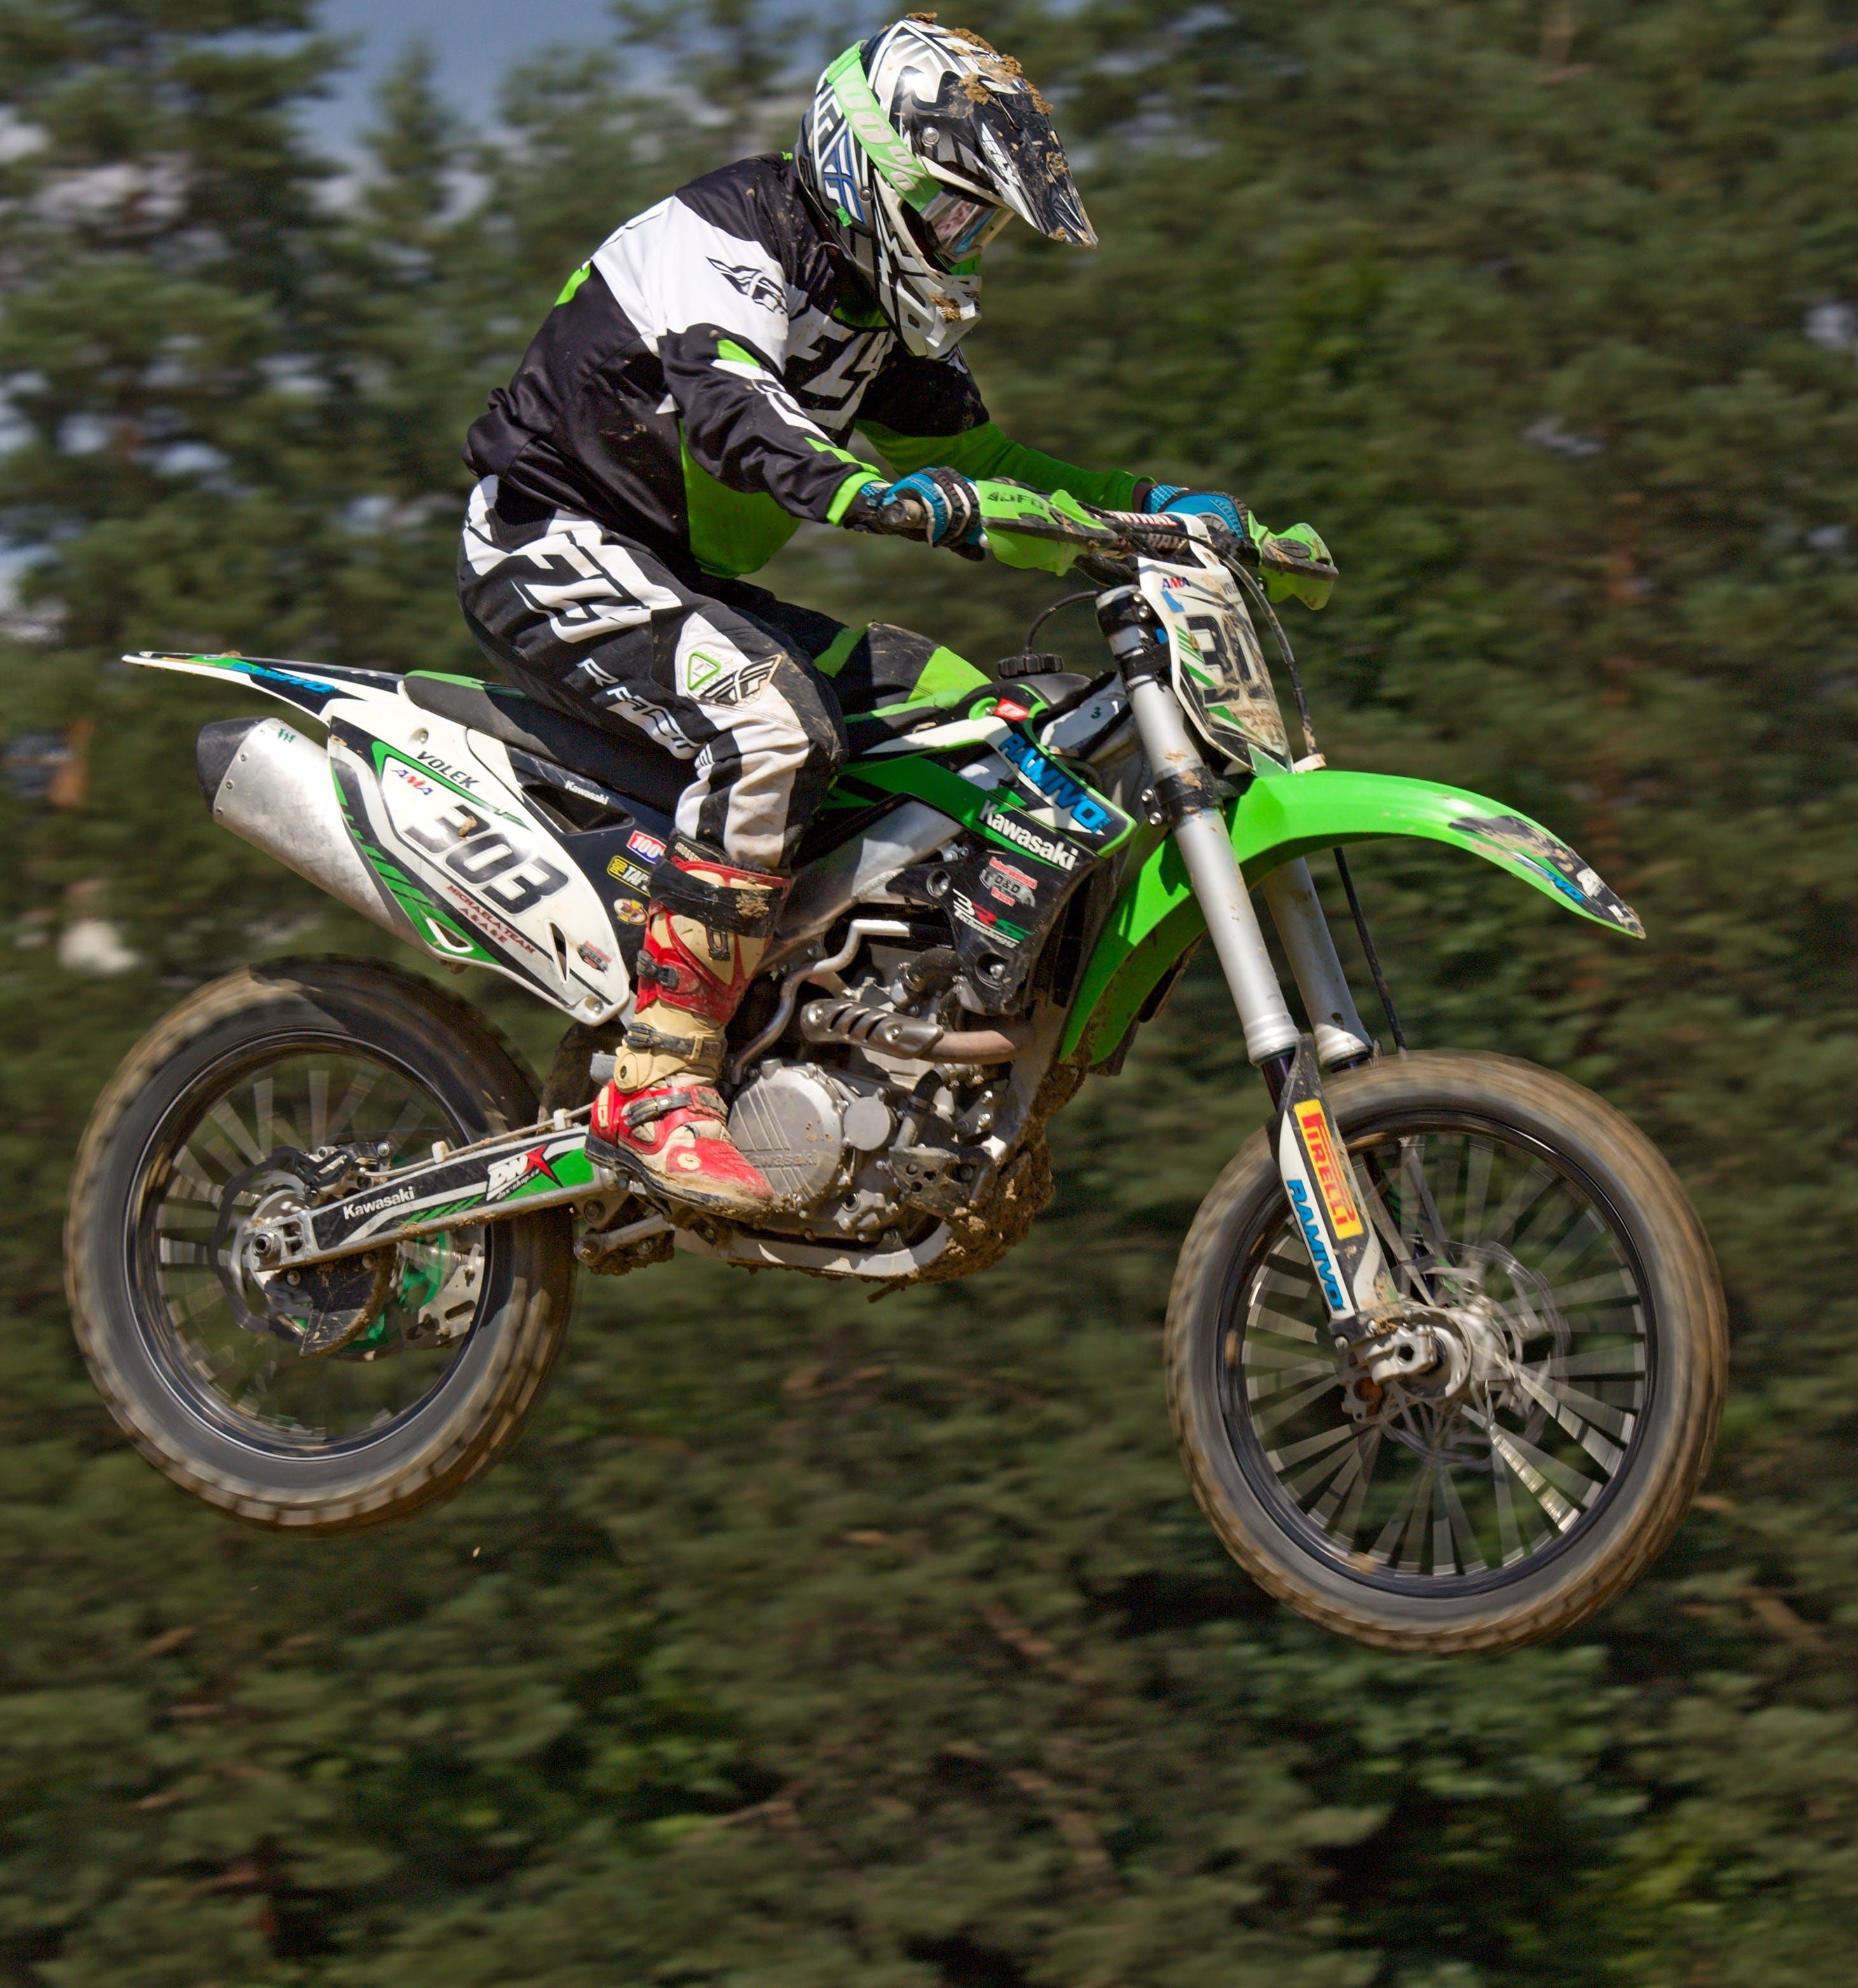 Gratis lagerfoto af hjelm, konkurrence, motocross, motorcykel